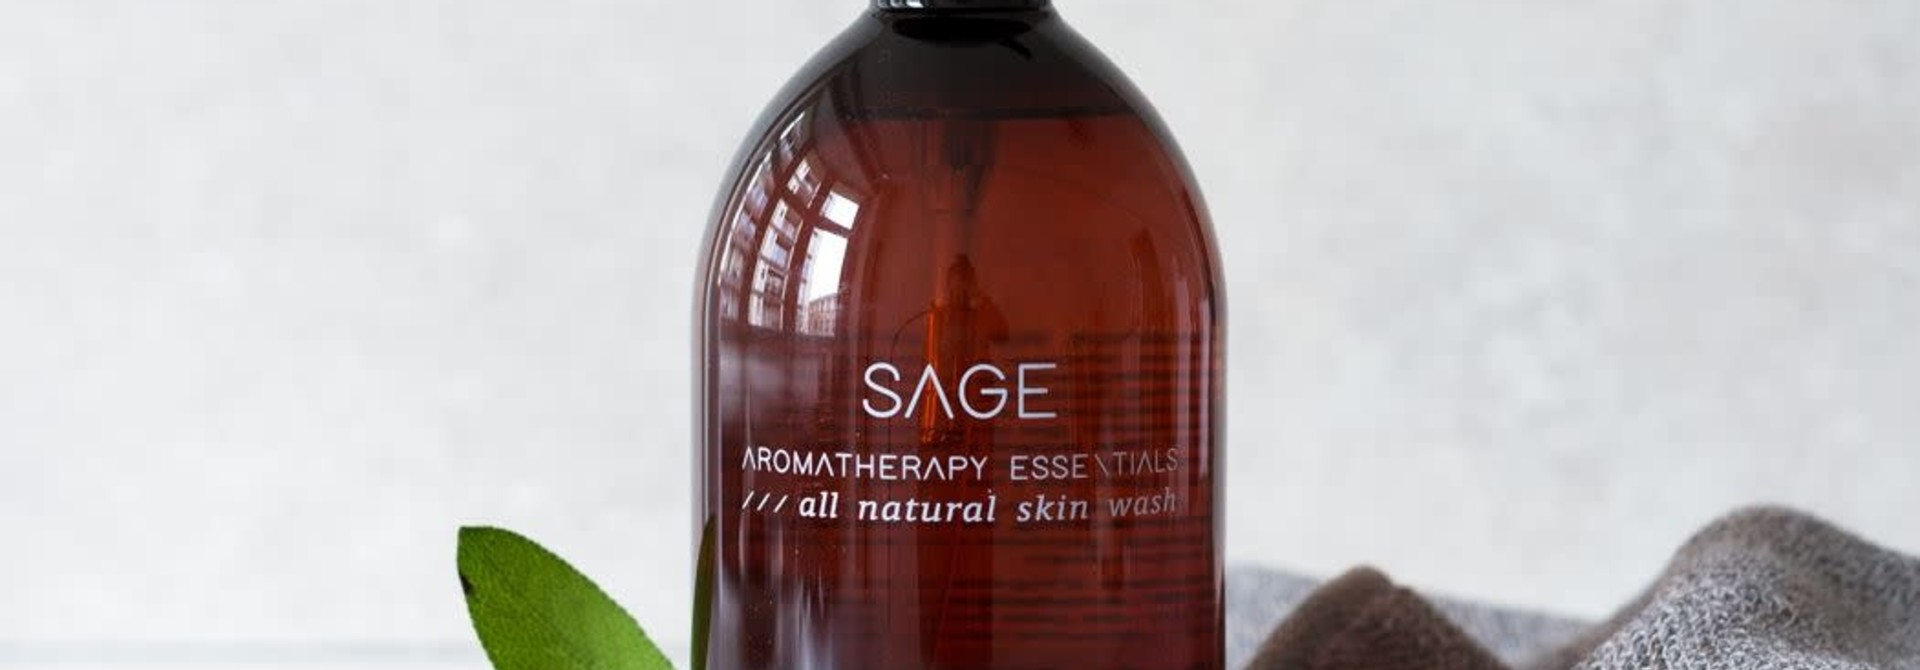 Skin Wash Sage